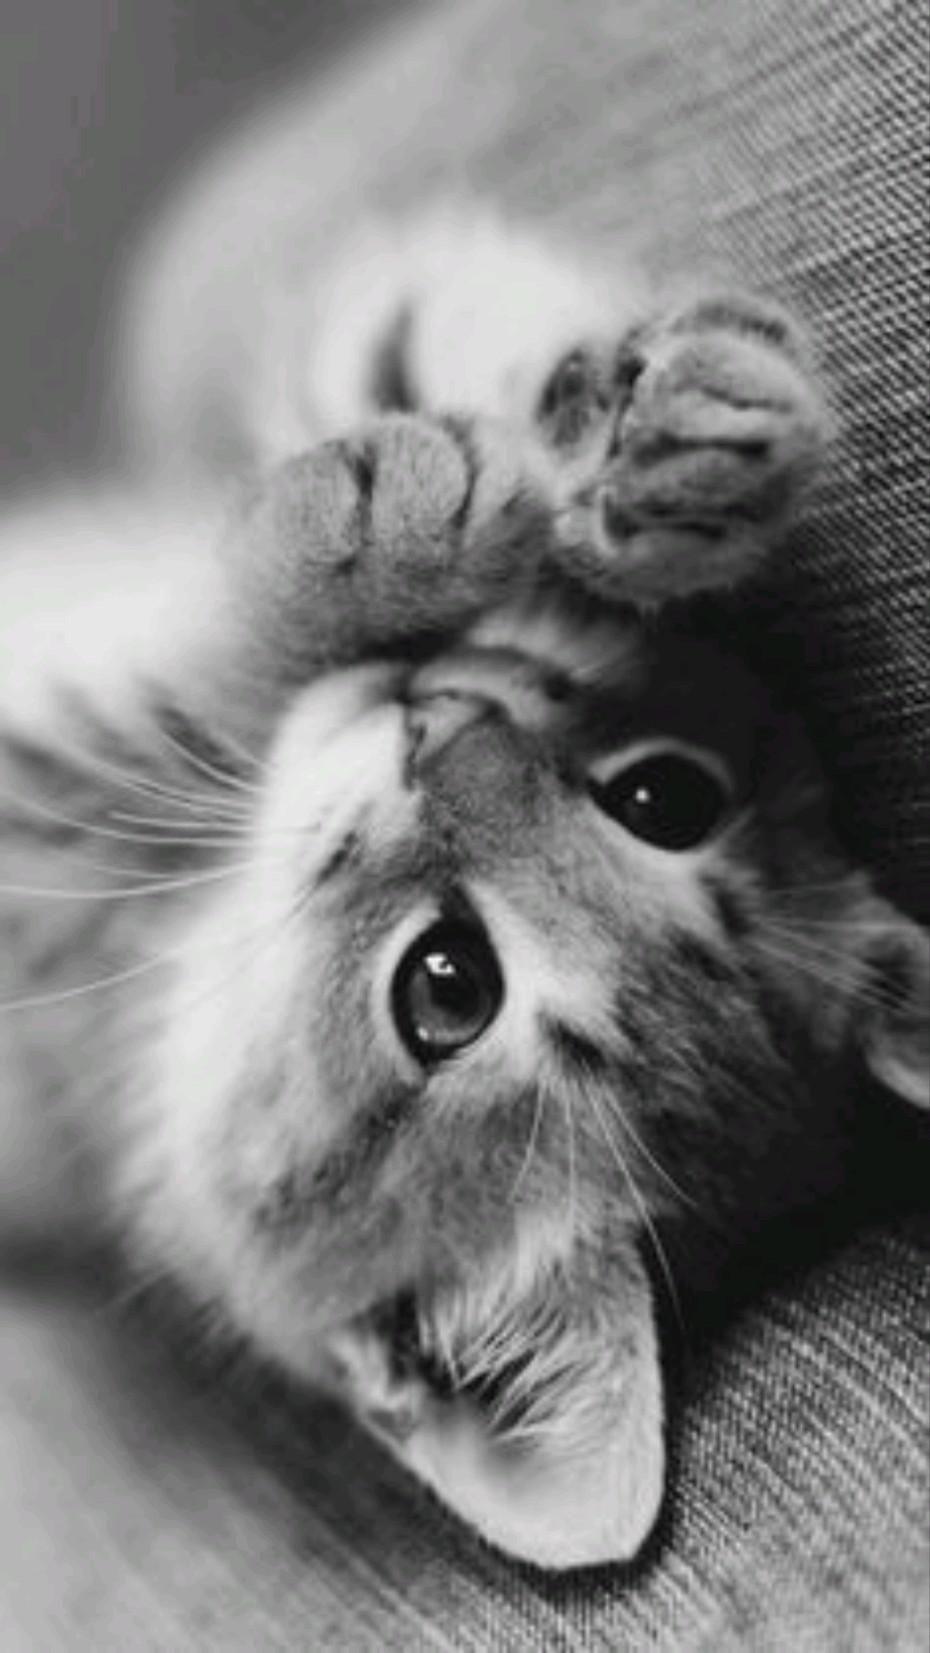 #Cat #cutie pie# black and white #aesthetic# love #kitten# beautiful